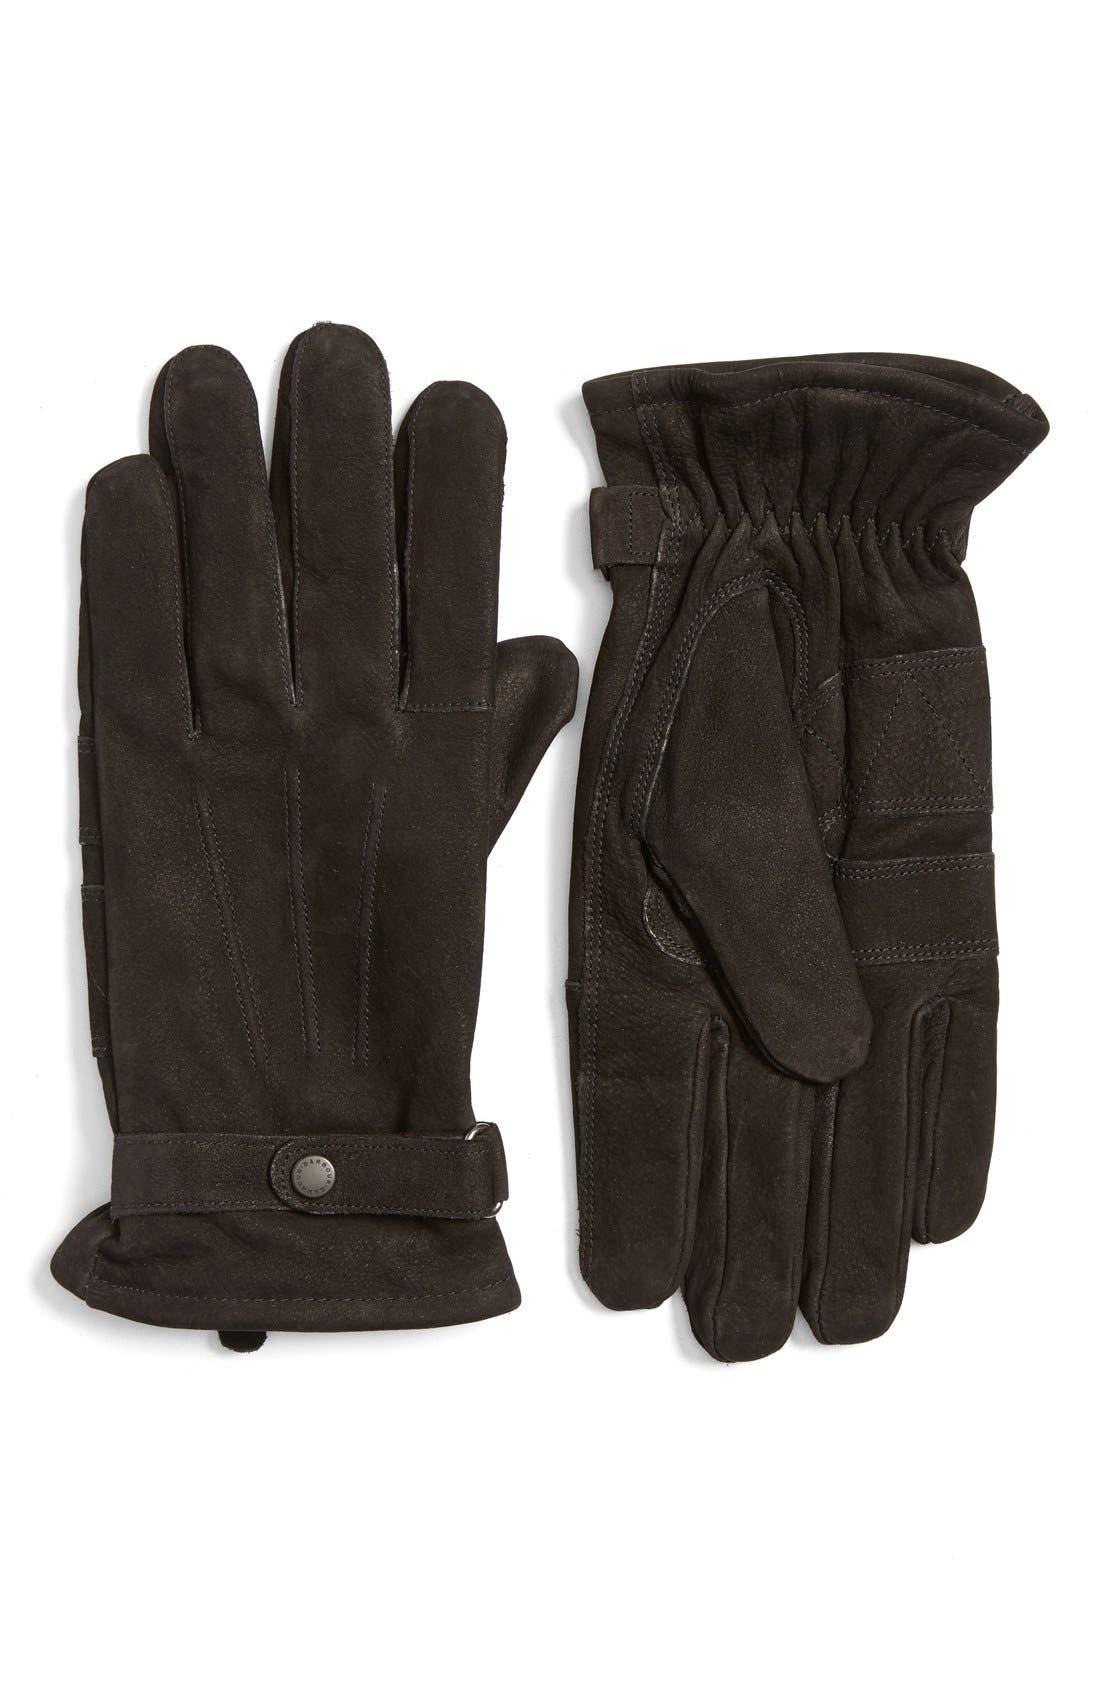 Mens leather gloves xl - Mens Leather Gloves Xl 35